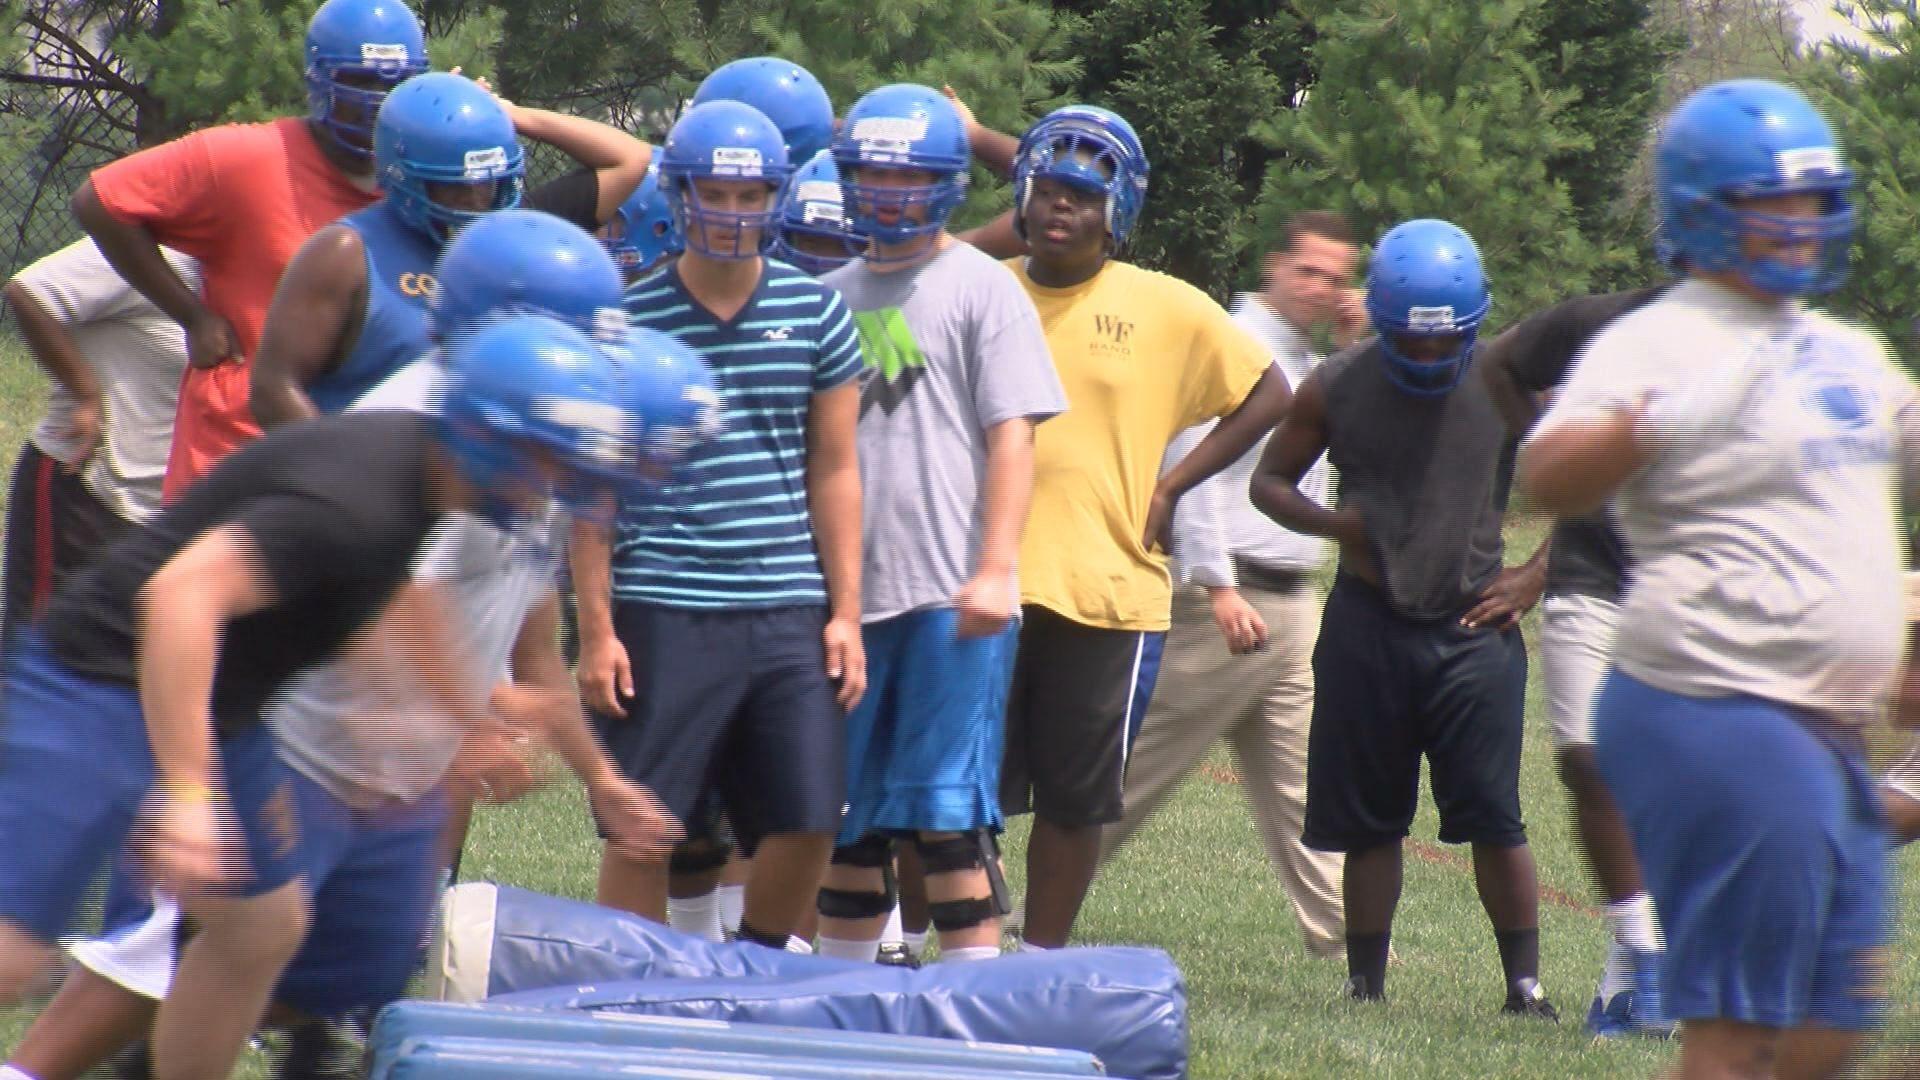 High school football season under way, head injuries under